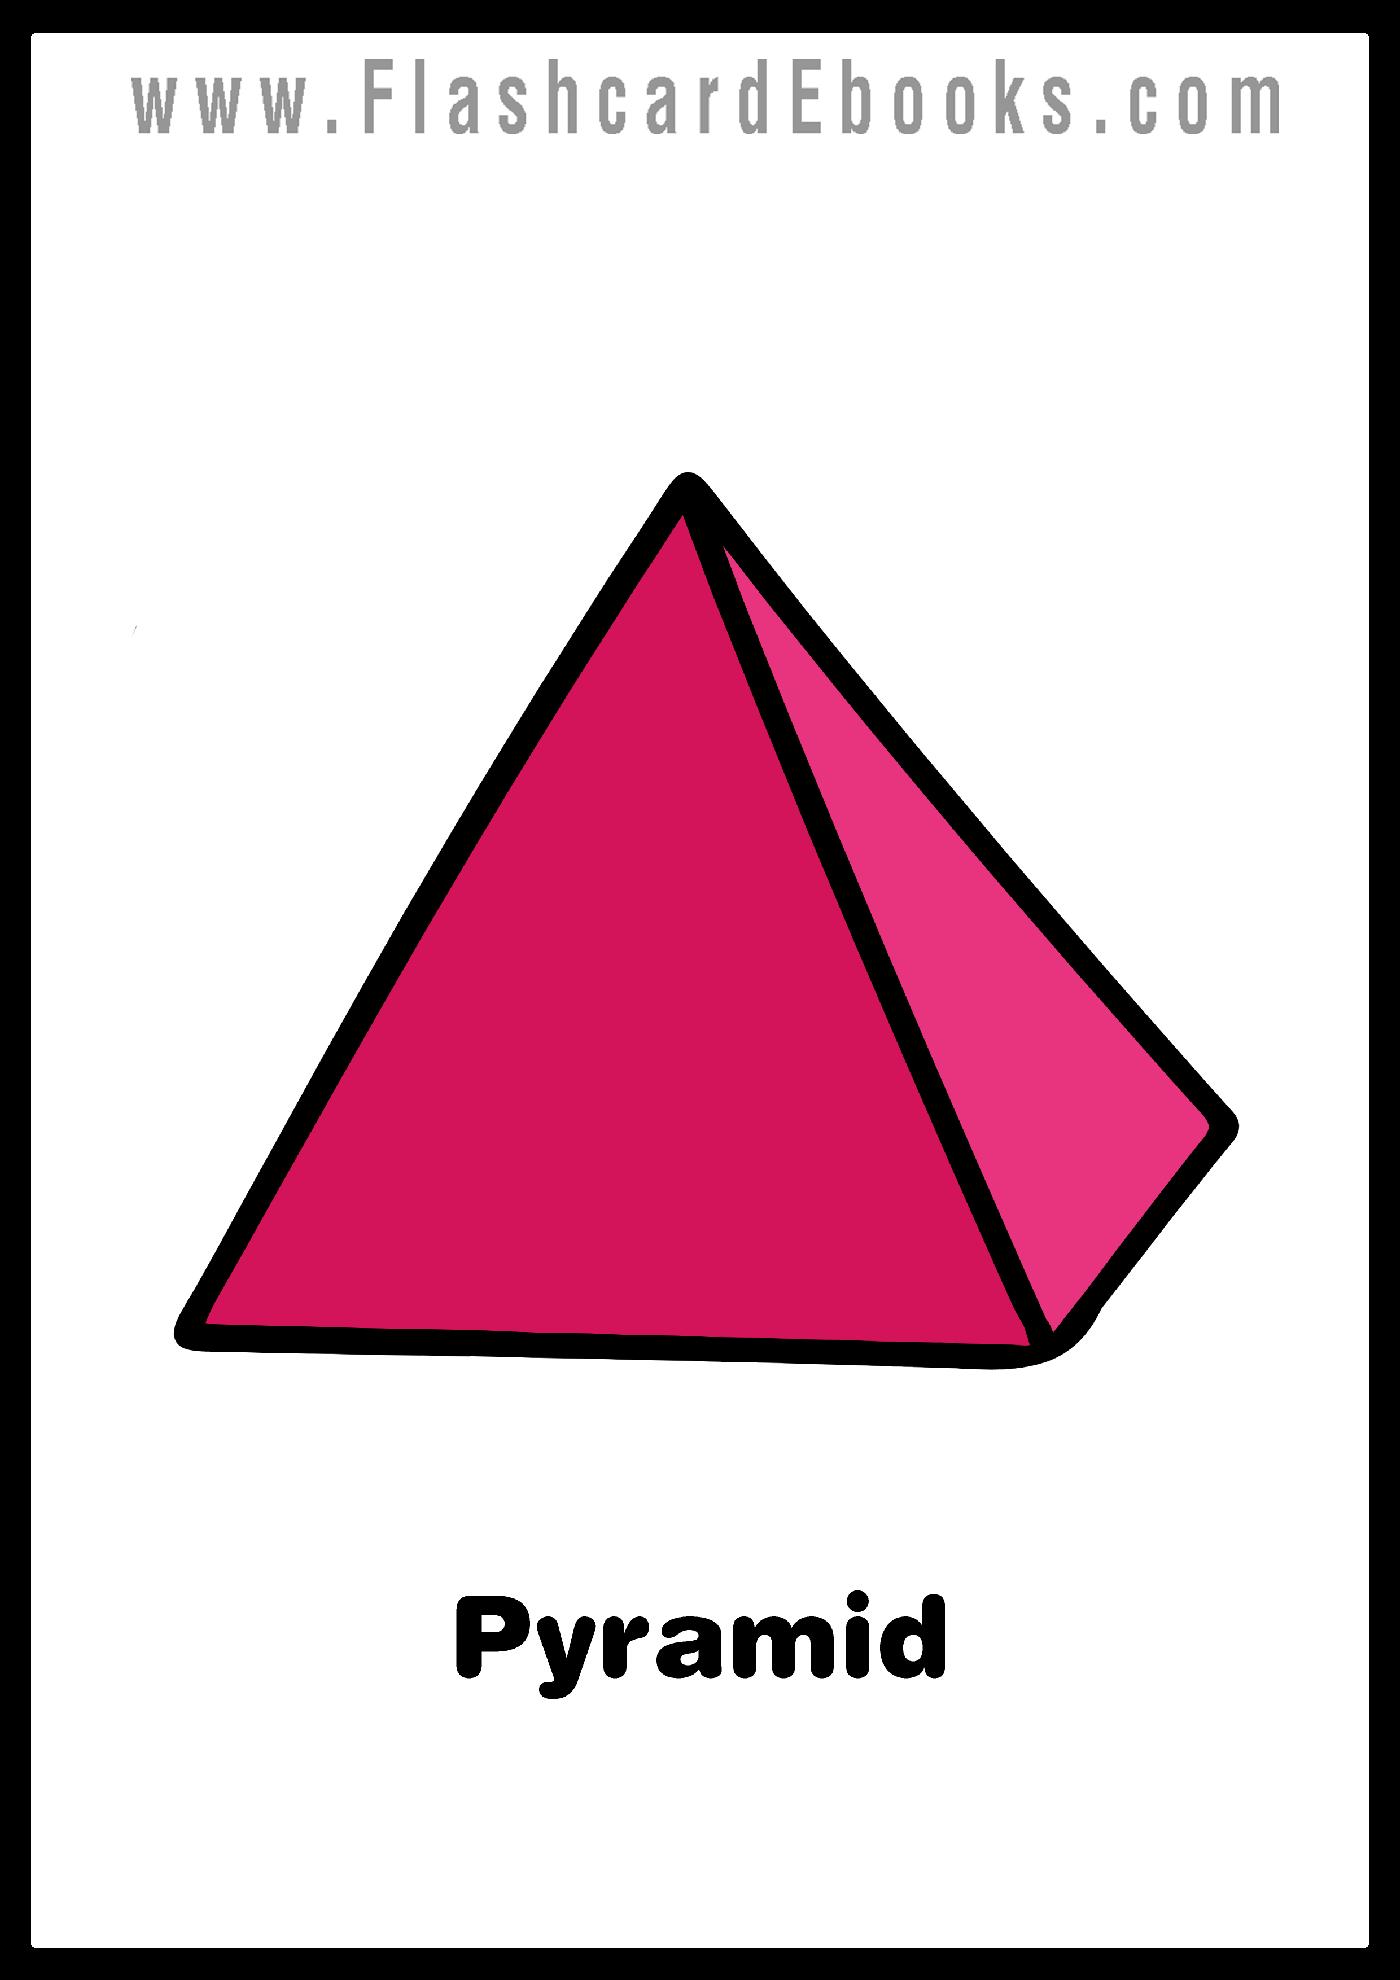 English Flashcard Kindle Shapes Pyramid